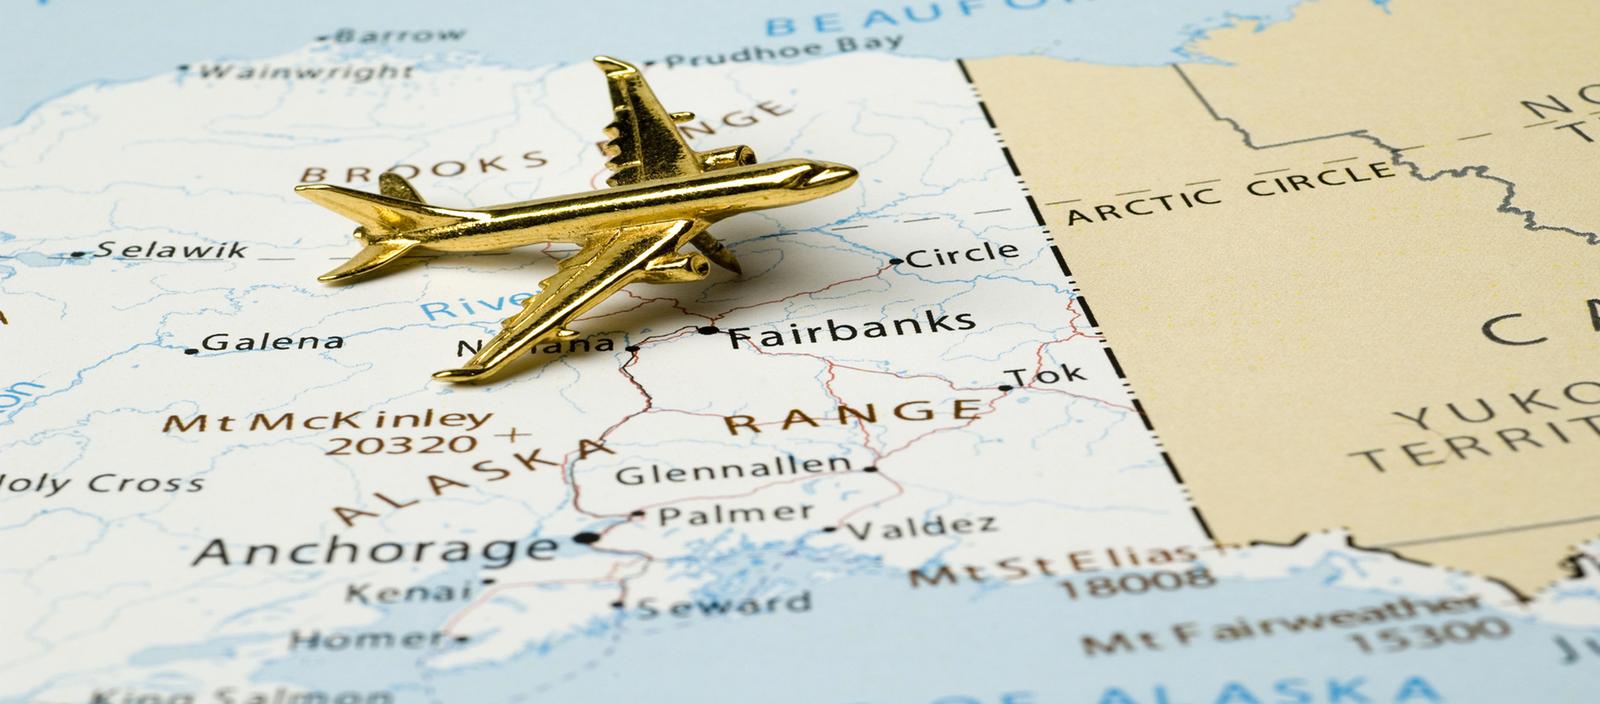 Plane figurine on map of Alaska